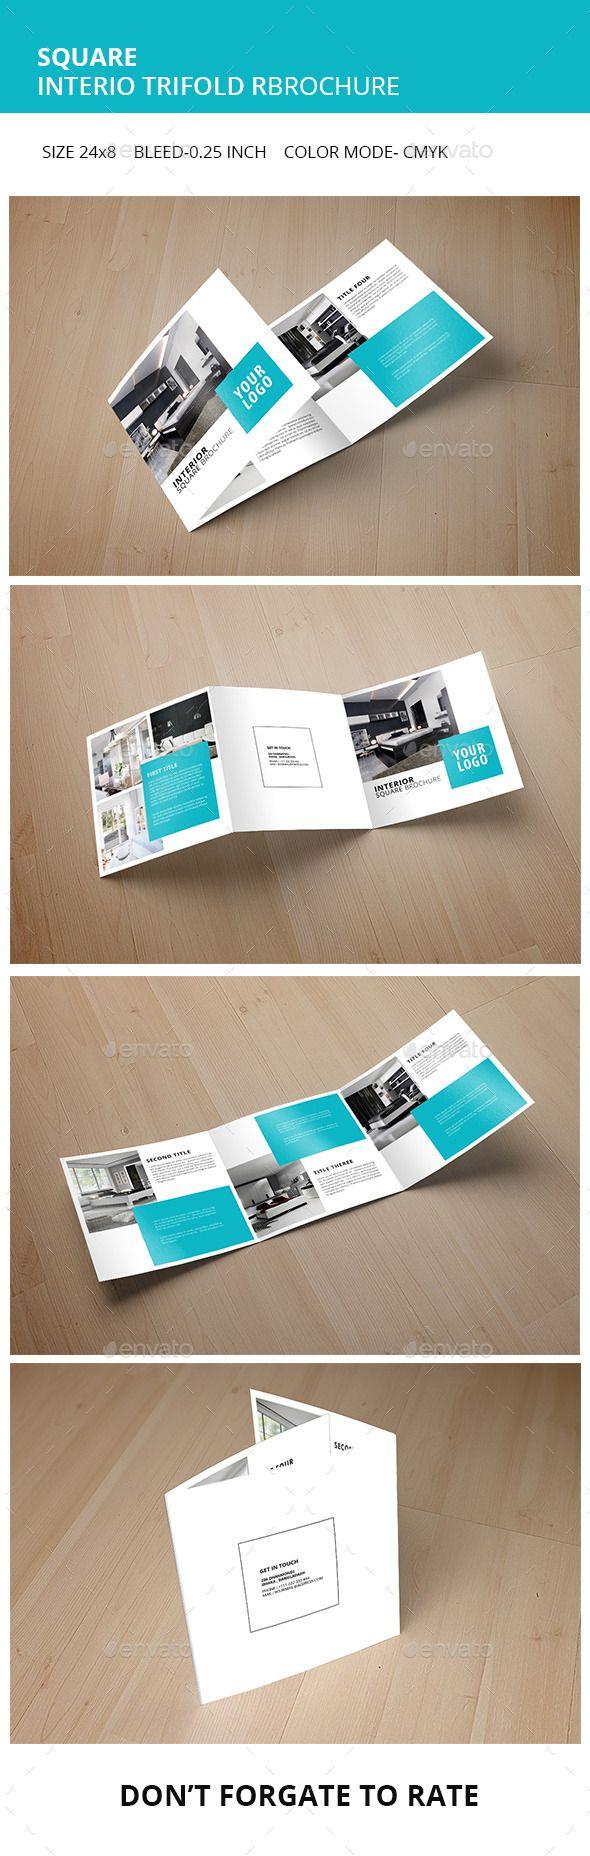 Square Interior Trifold Brochure Template. Download: http://graphicriver.net/item/square-interior-trifold-brochure/11277551?ref=ksioks